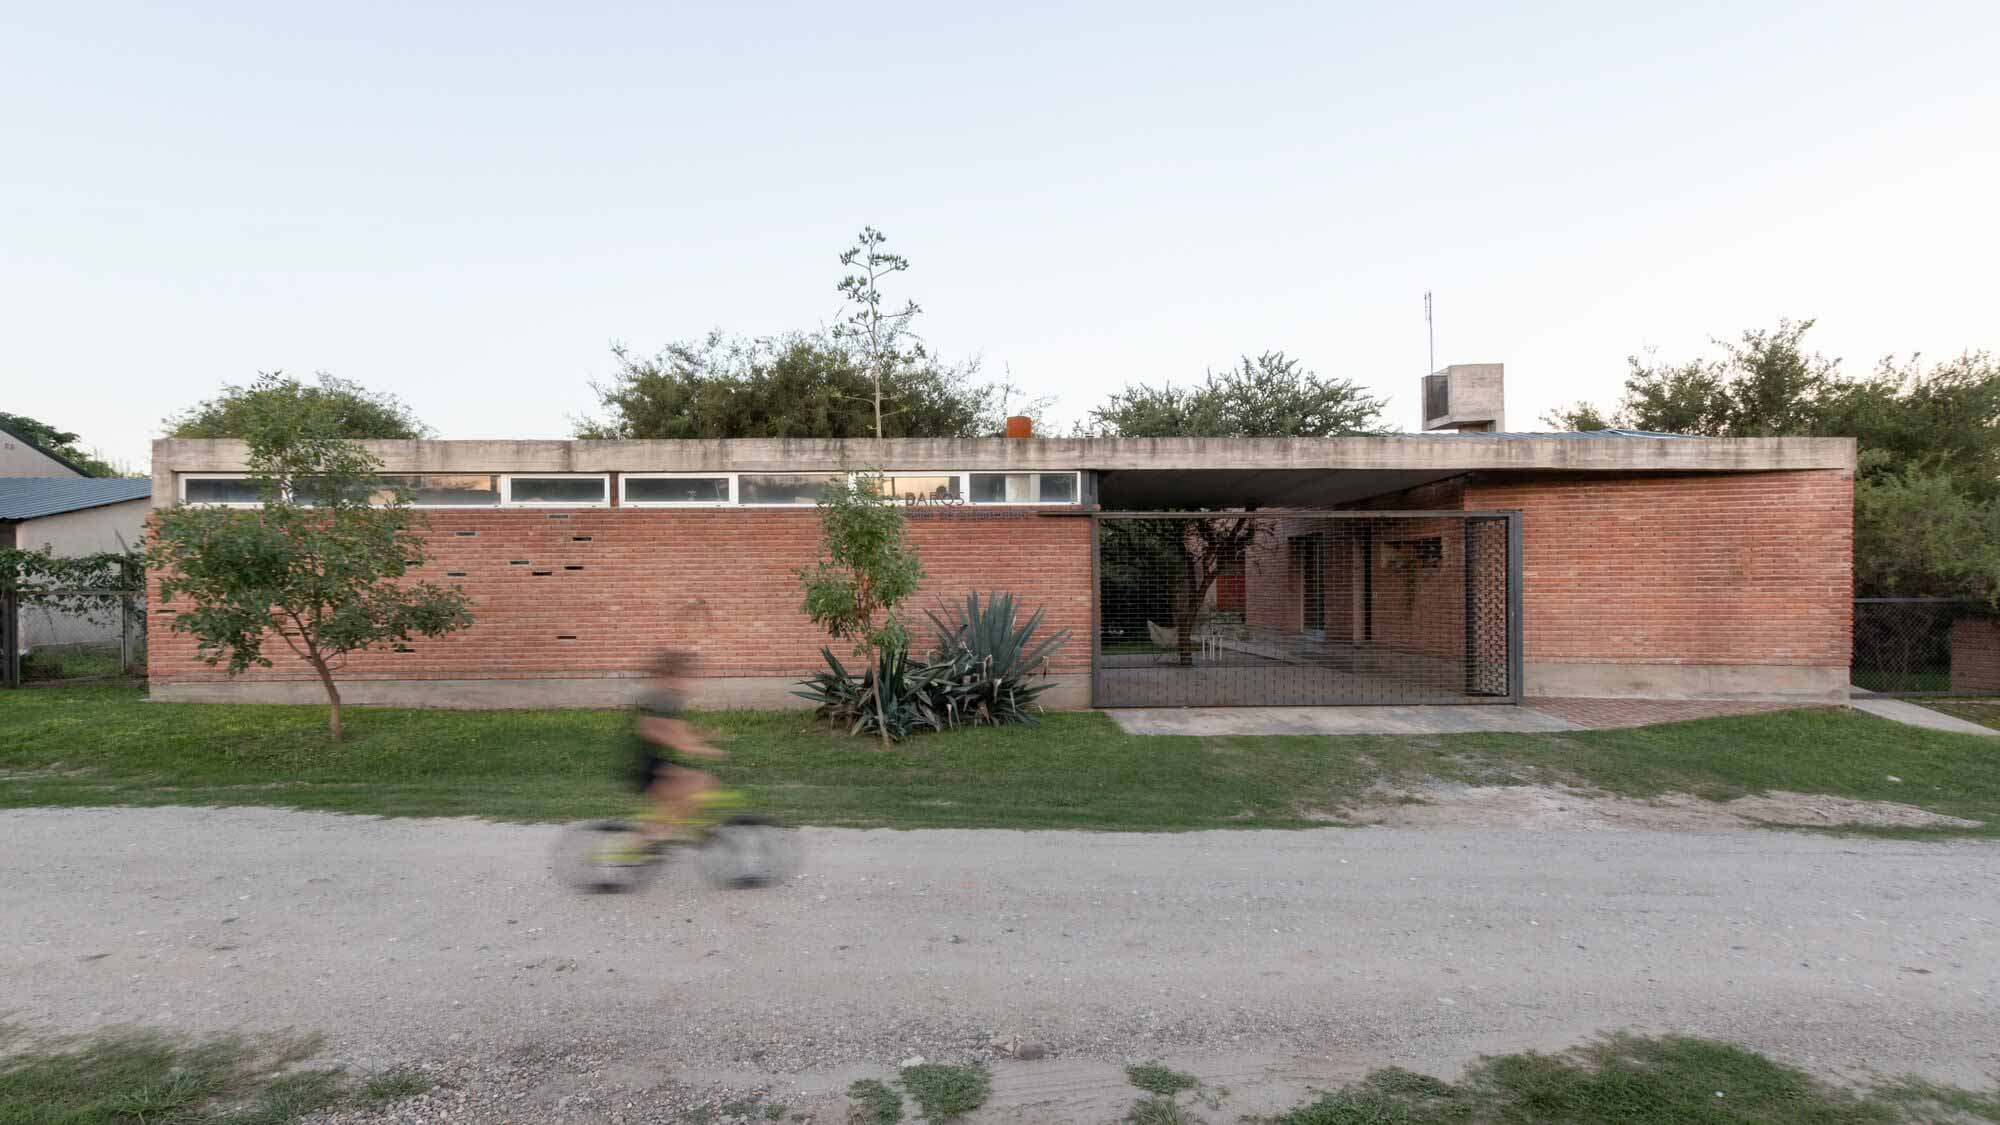 Дом — Мастерская / Barq's taller de arquitectura